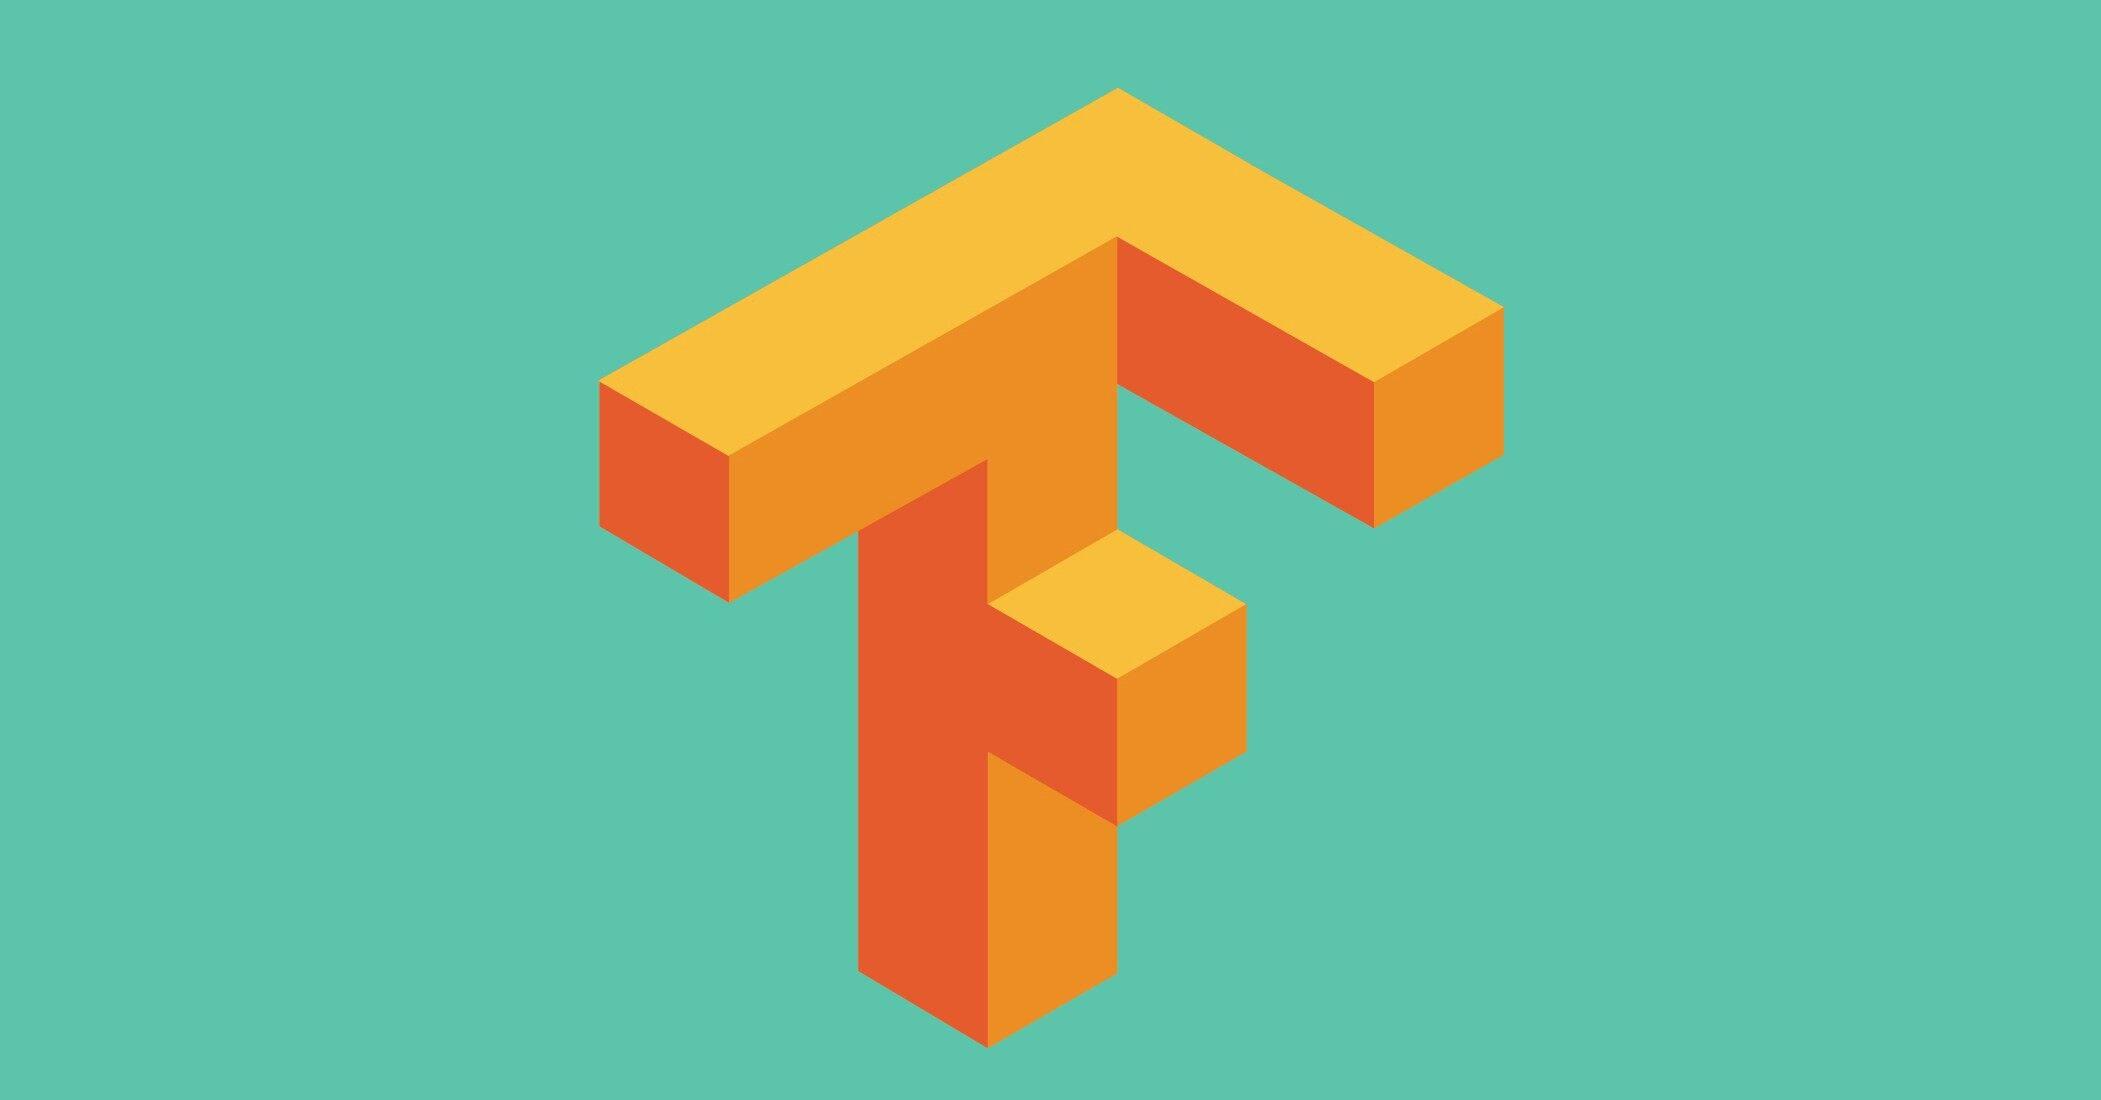 Amazon SageMaker 现在可支持其他实例类型、本地模式、开源容器、MXNet 和 Tensorflow 更新